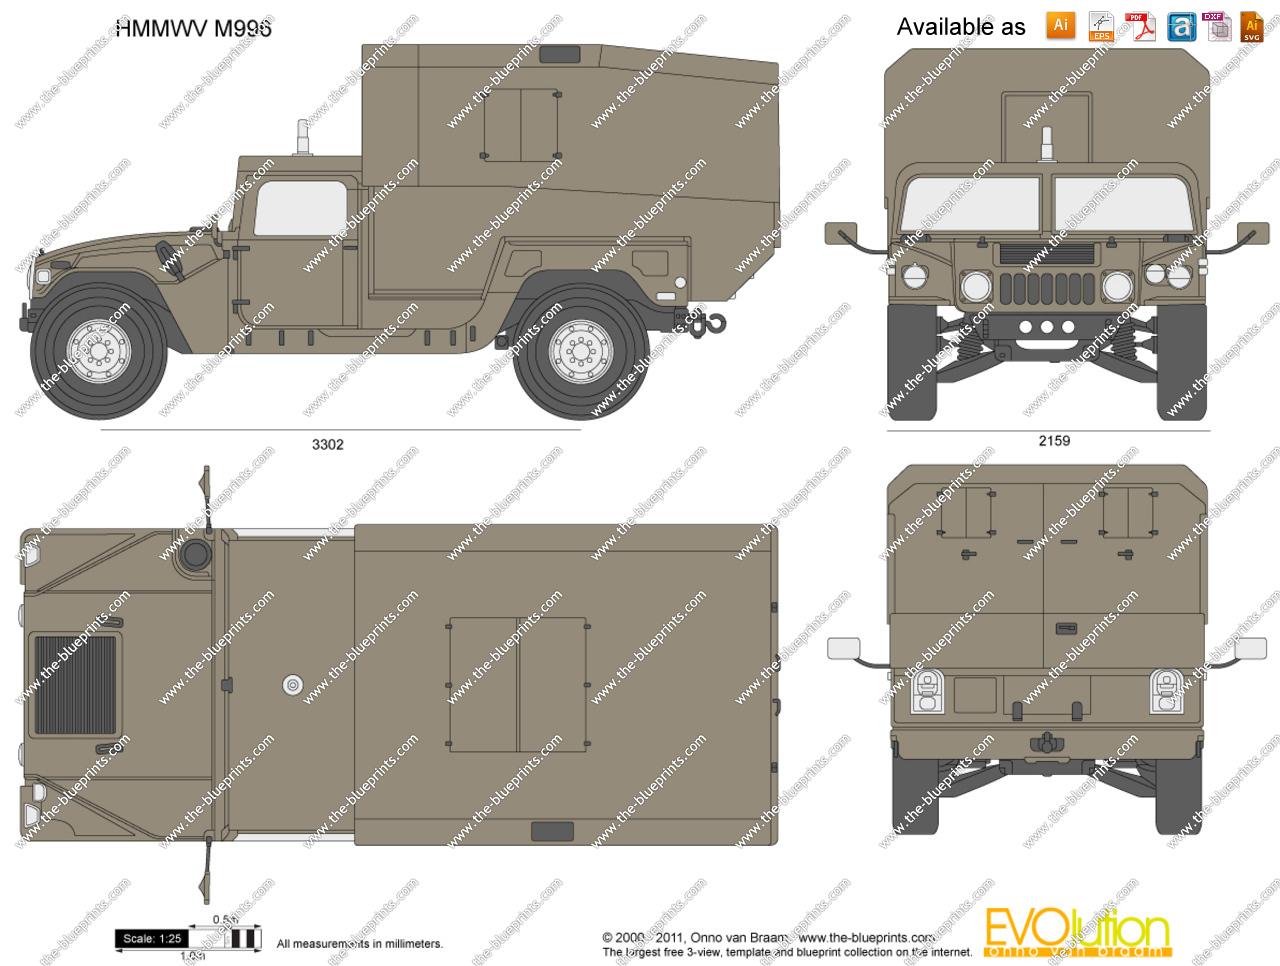 1280x966 Hmmwv M996 Vector Drawing